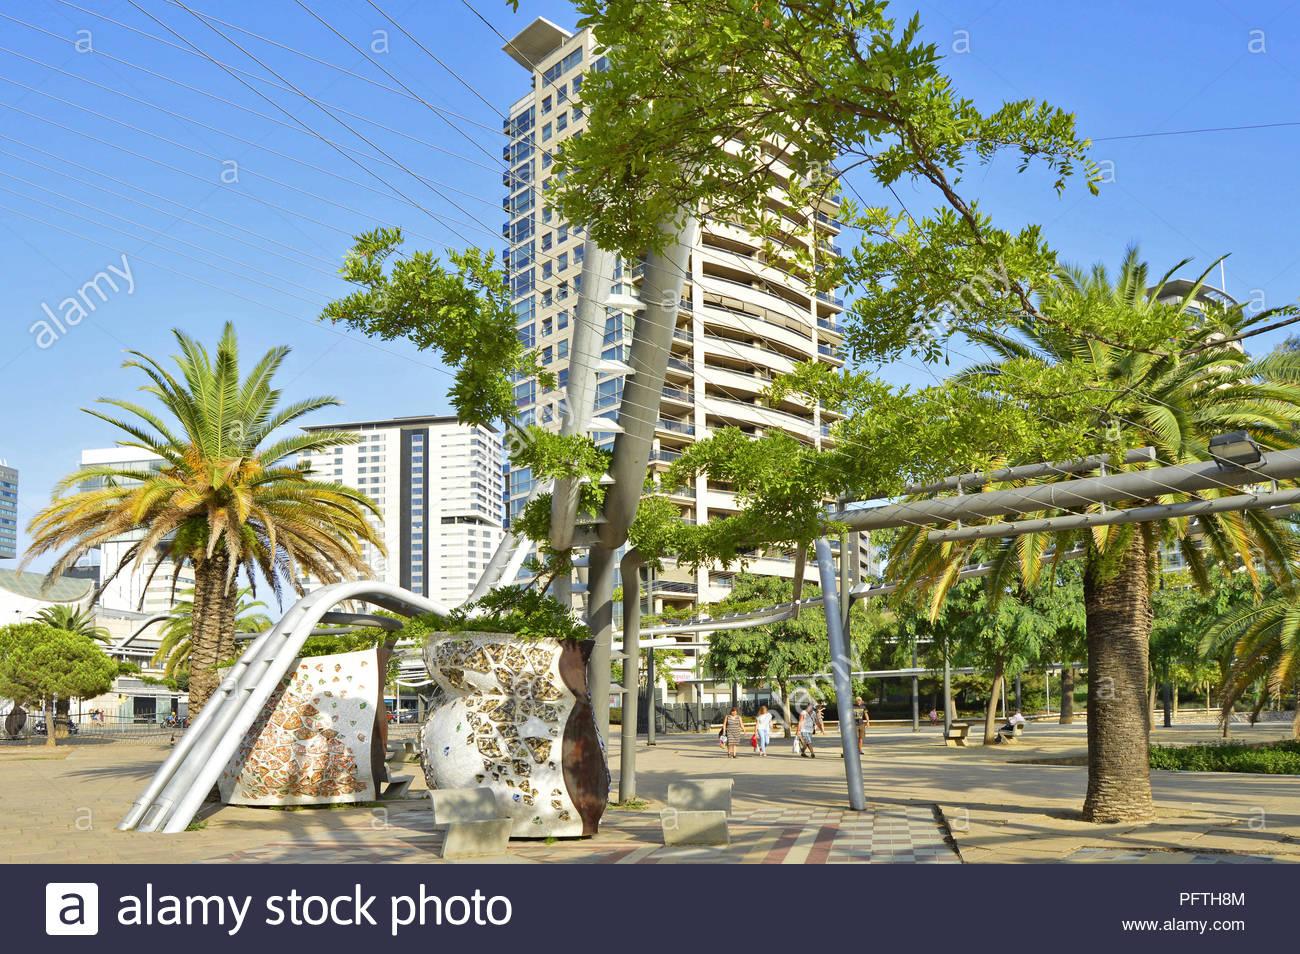 Parc Diagonal Mar - urban park lush greenery and hi-rise residential properties in Sant Marti district of Barcelona Spain Europe. Stock Photo